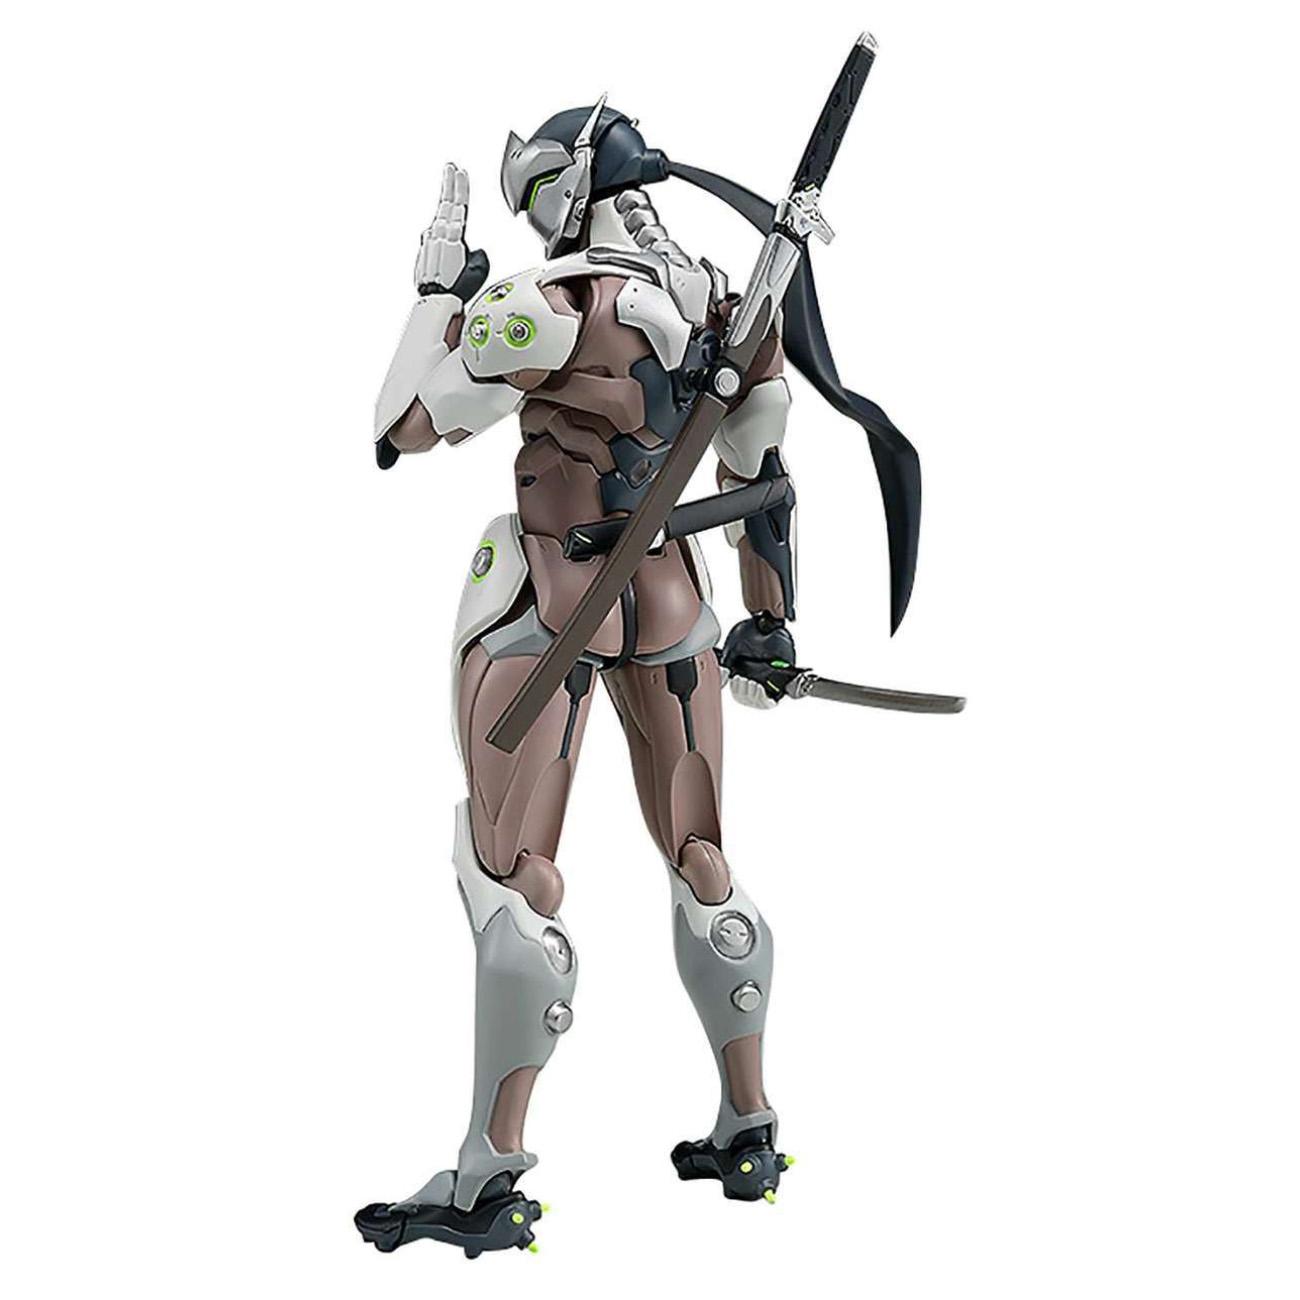 Overwatch Figma Genji Action Figure| Blink Kuwait